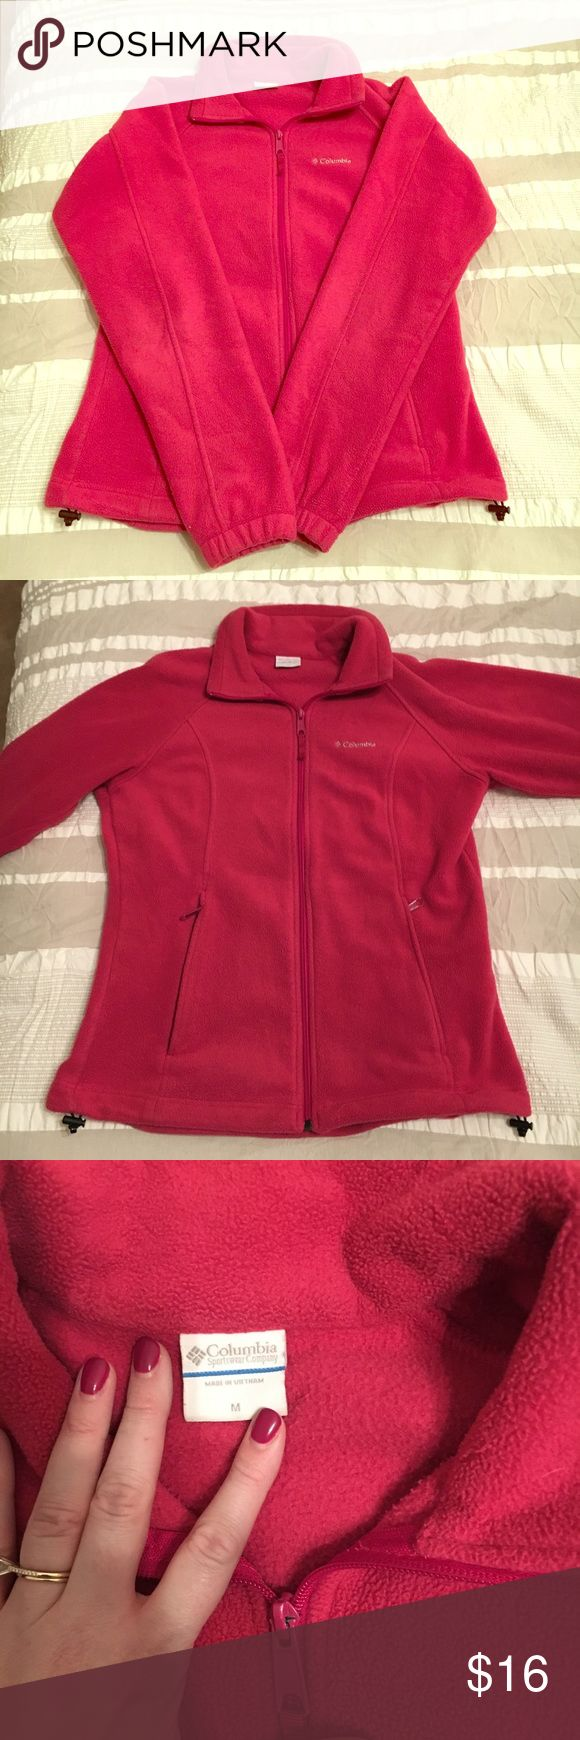 Pink Columbia Fleece Super soft Columbia Fleece Jacket! I somehow have two so need to sell one! Columbia Jackets & Coats